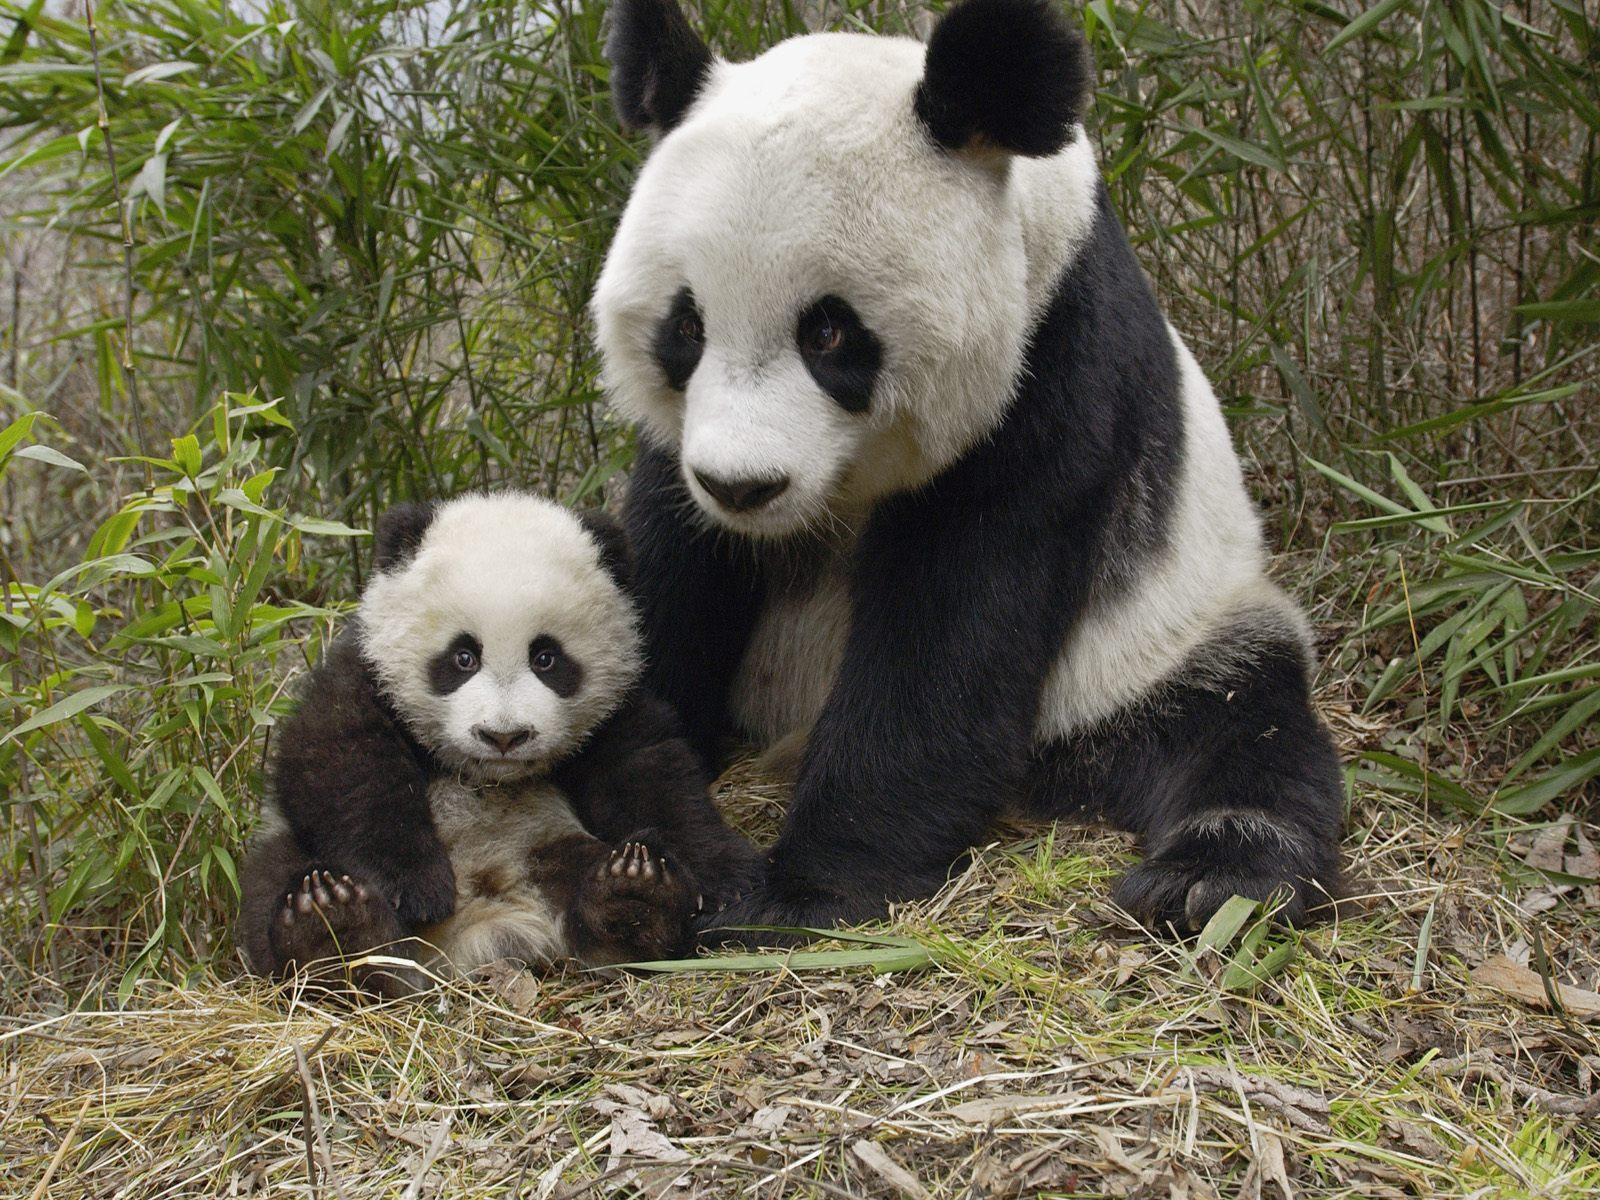 http://3.bp.blogspot.com/-3W8-2tNXv9A/Tz__tFThfXI/AAAAAAAADYc/ipHjIliUgjs/s1600/Baby+Panda+wallpaper+3.jpg